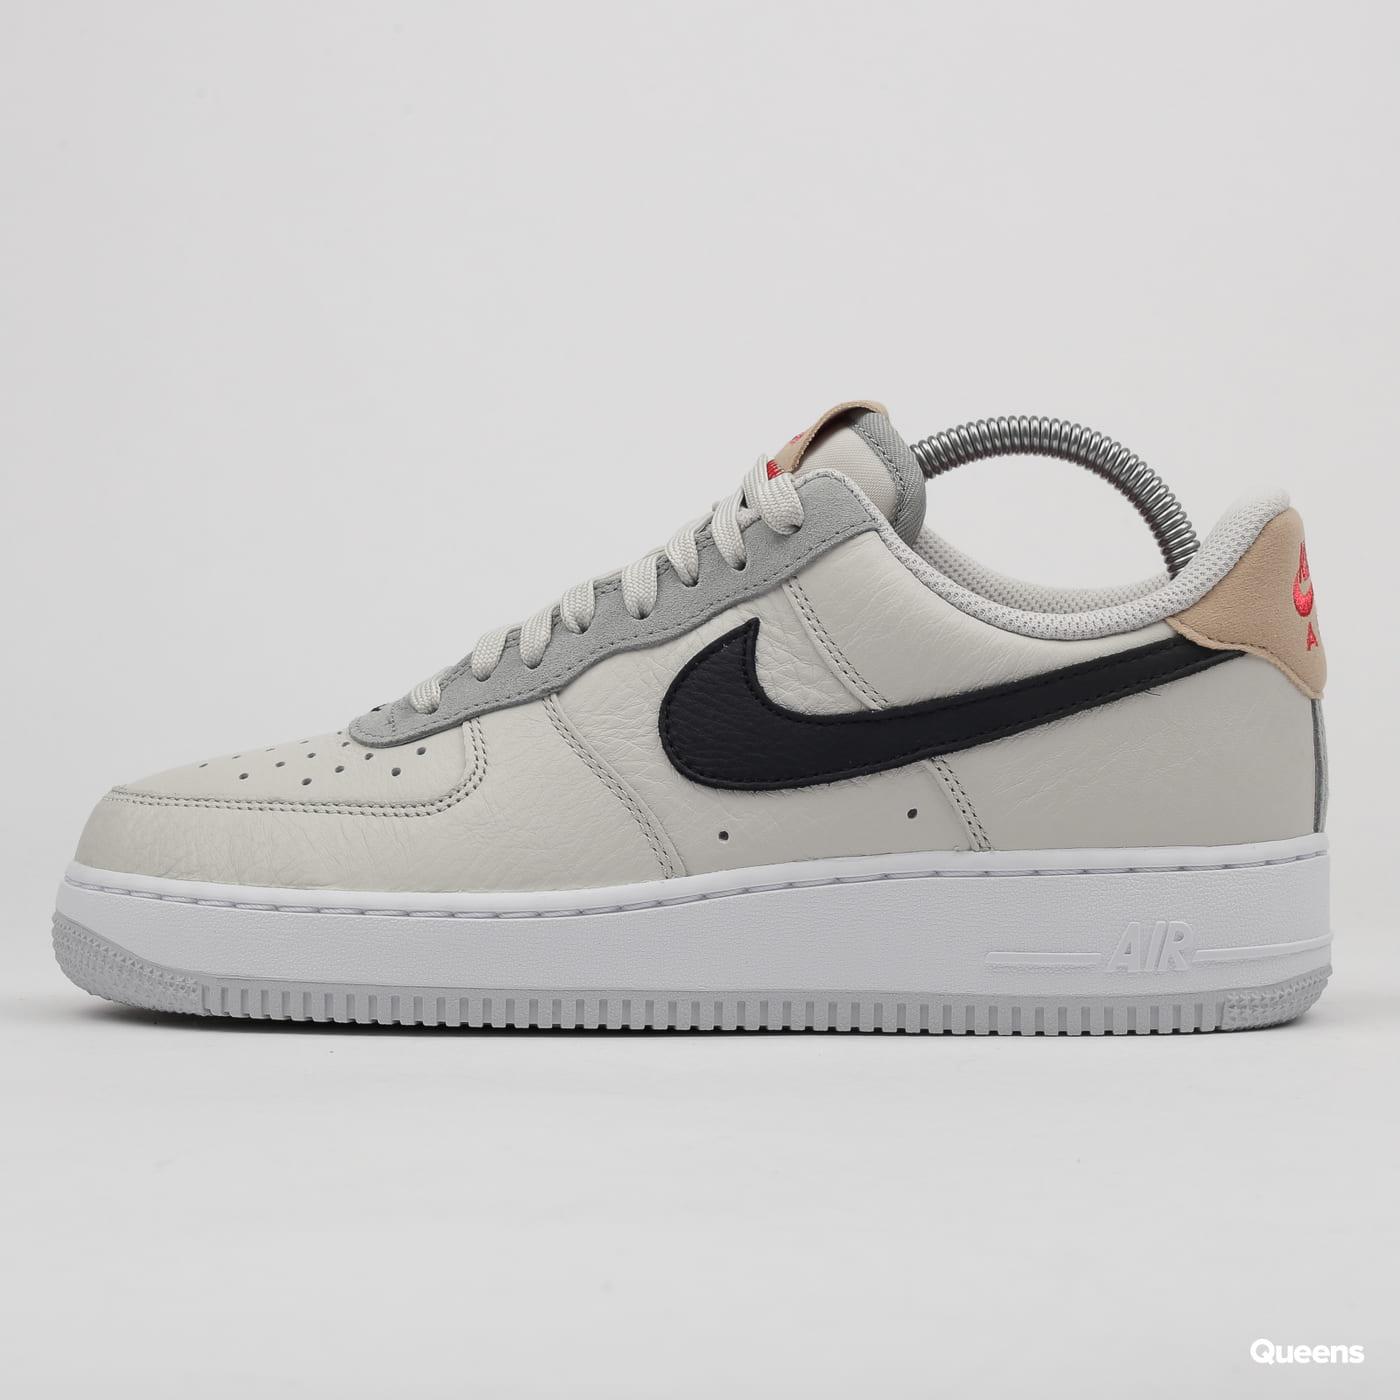 check out 1c033 60208 Zoom in Zoom in Zoom in Zoom in Zoom in. Nike Air Force 1  07 ...